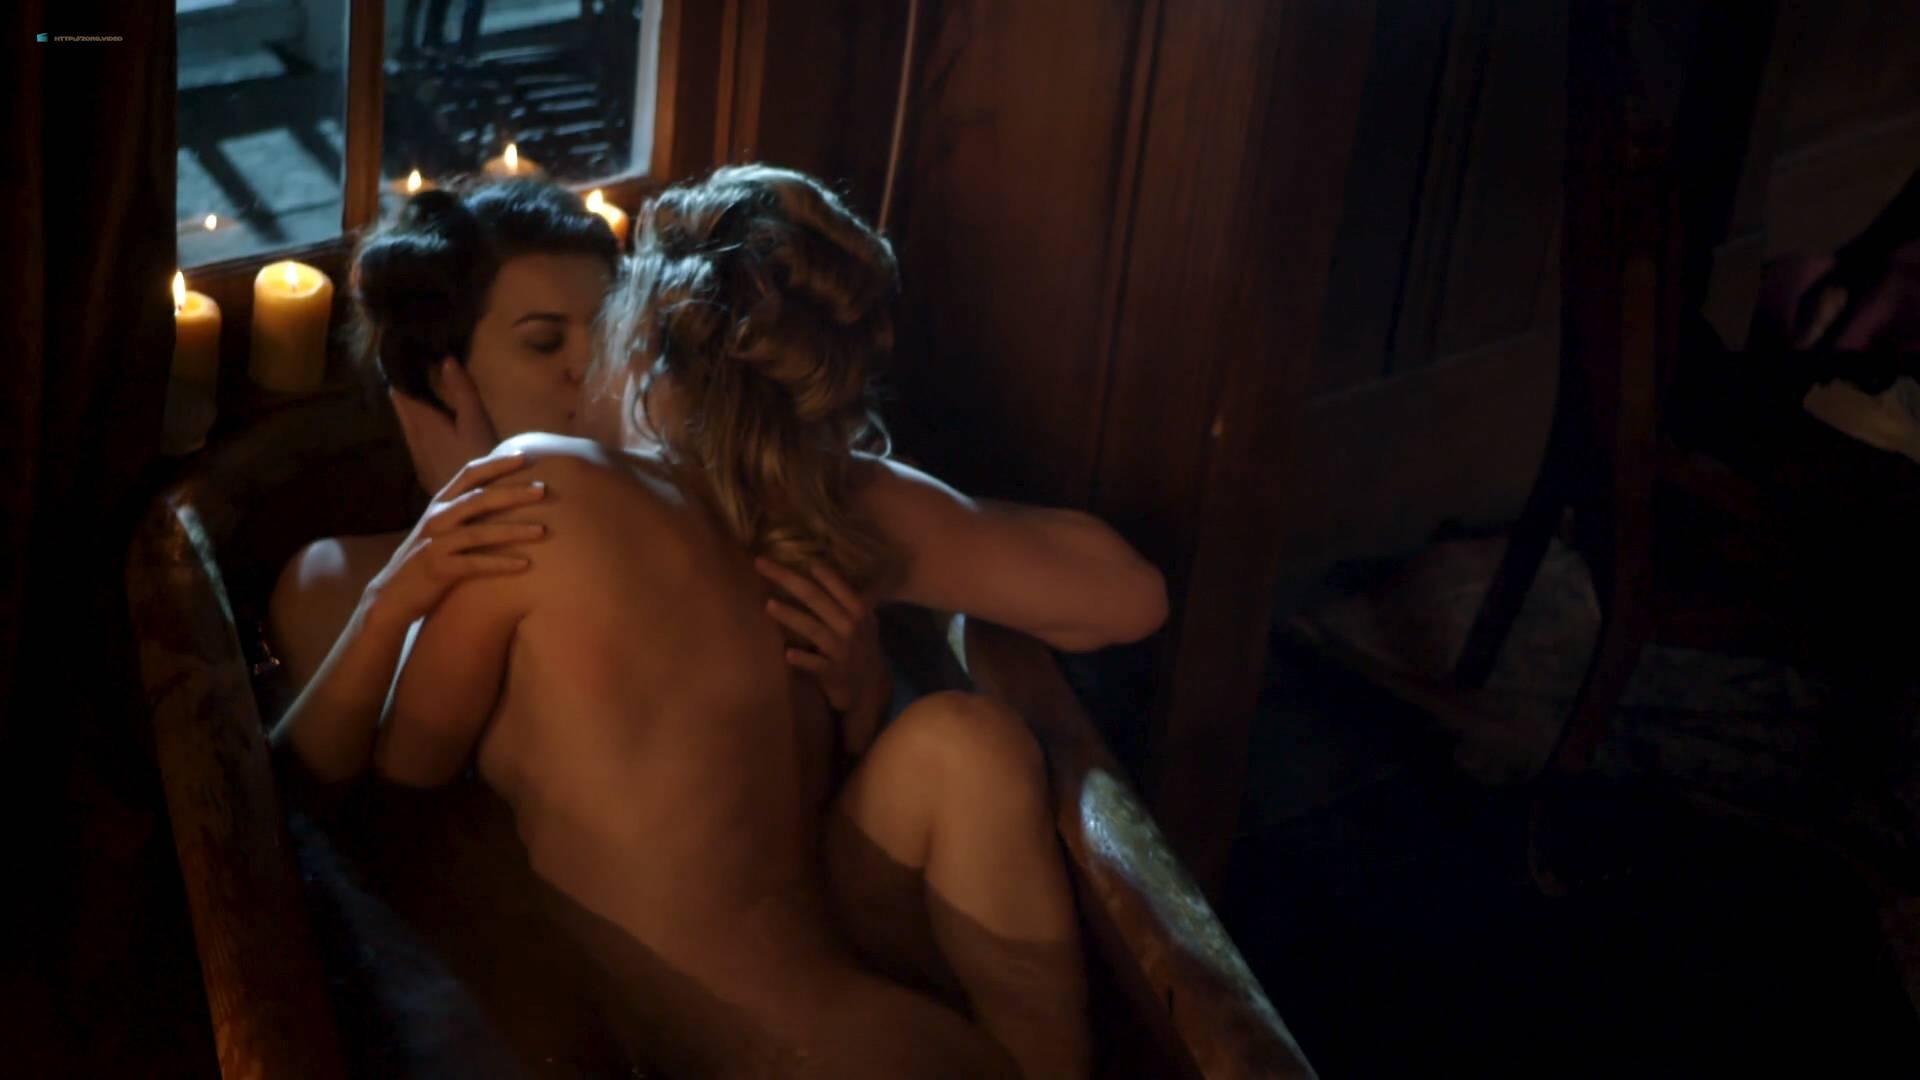 Elizabeth Lavender nude topless Elysia Rotaru nude butt boobs - Dead Again in Tombstone (2017) HD 1080p BluRay (6)